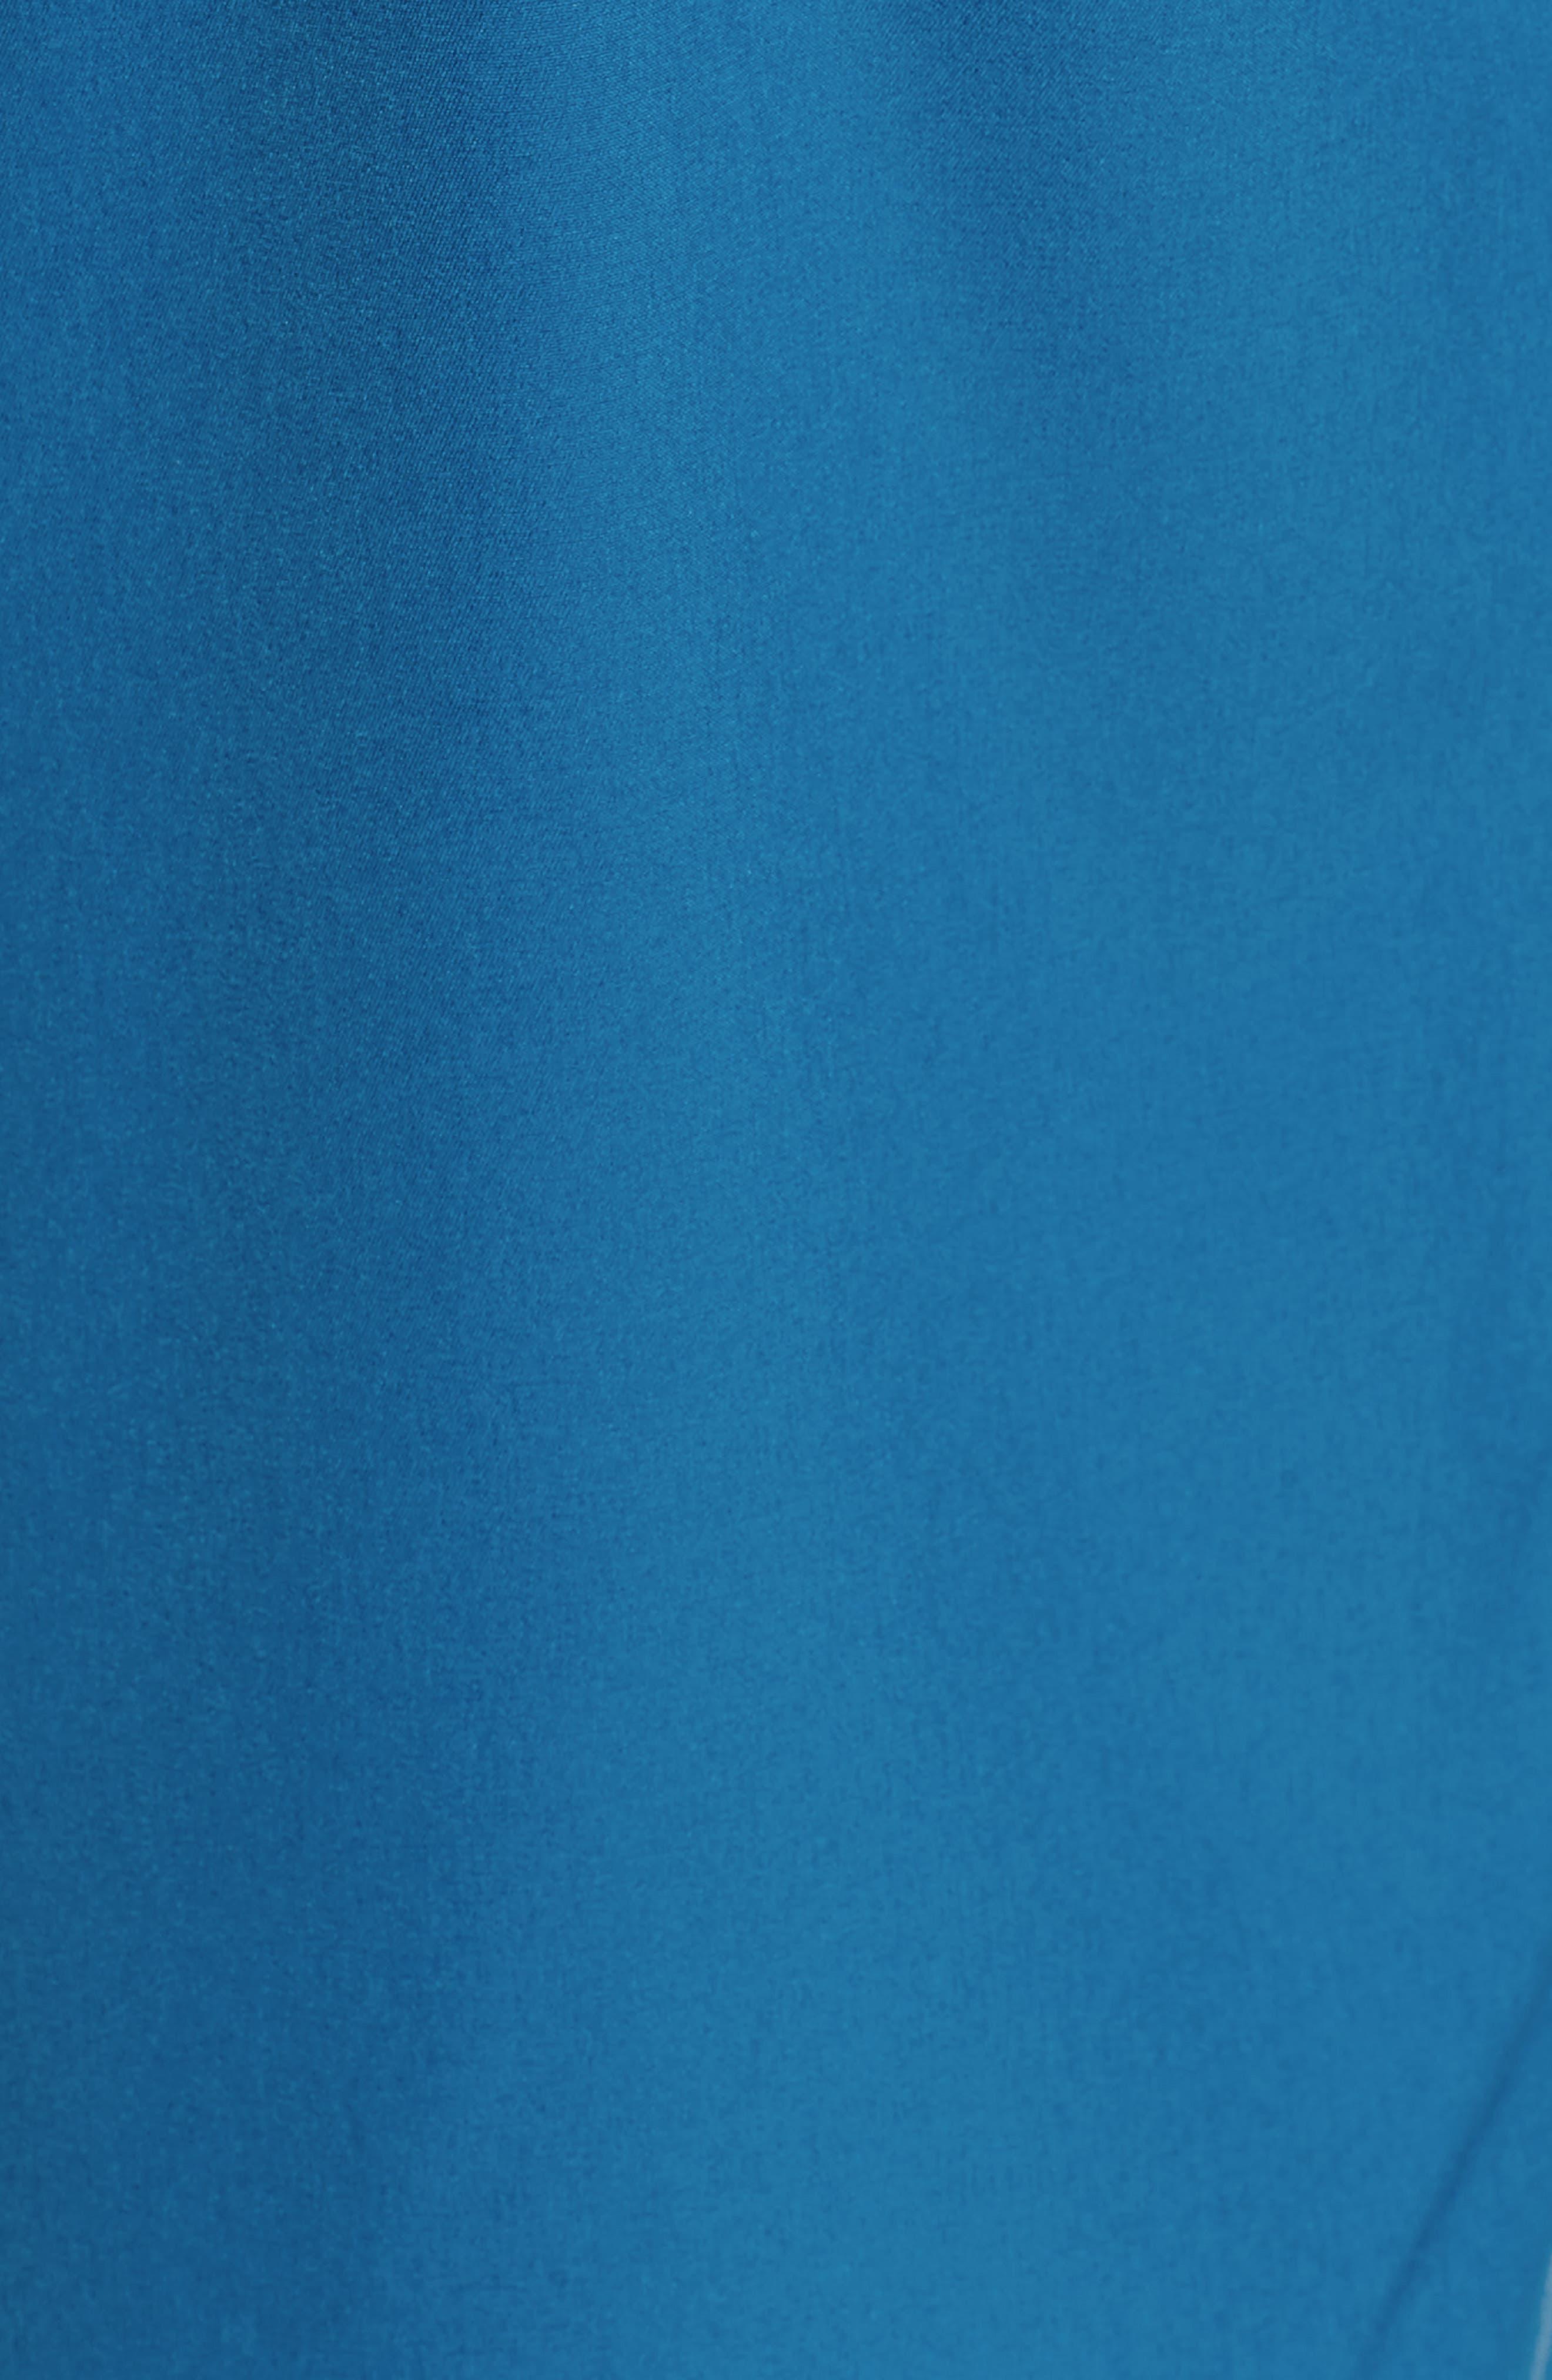 Superfreak Board Shorts,                             Alternate thumbnail 15, color,